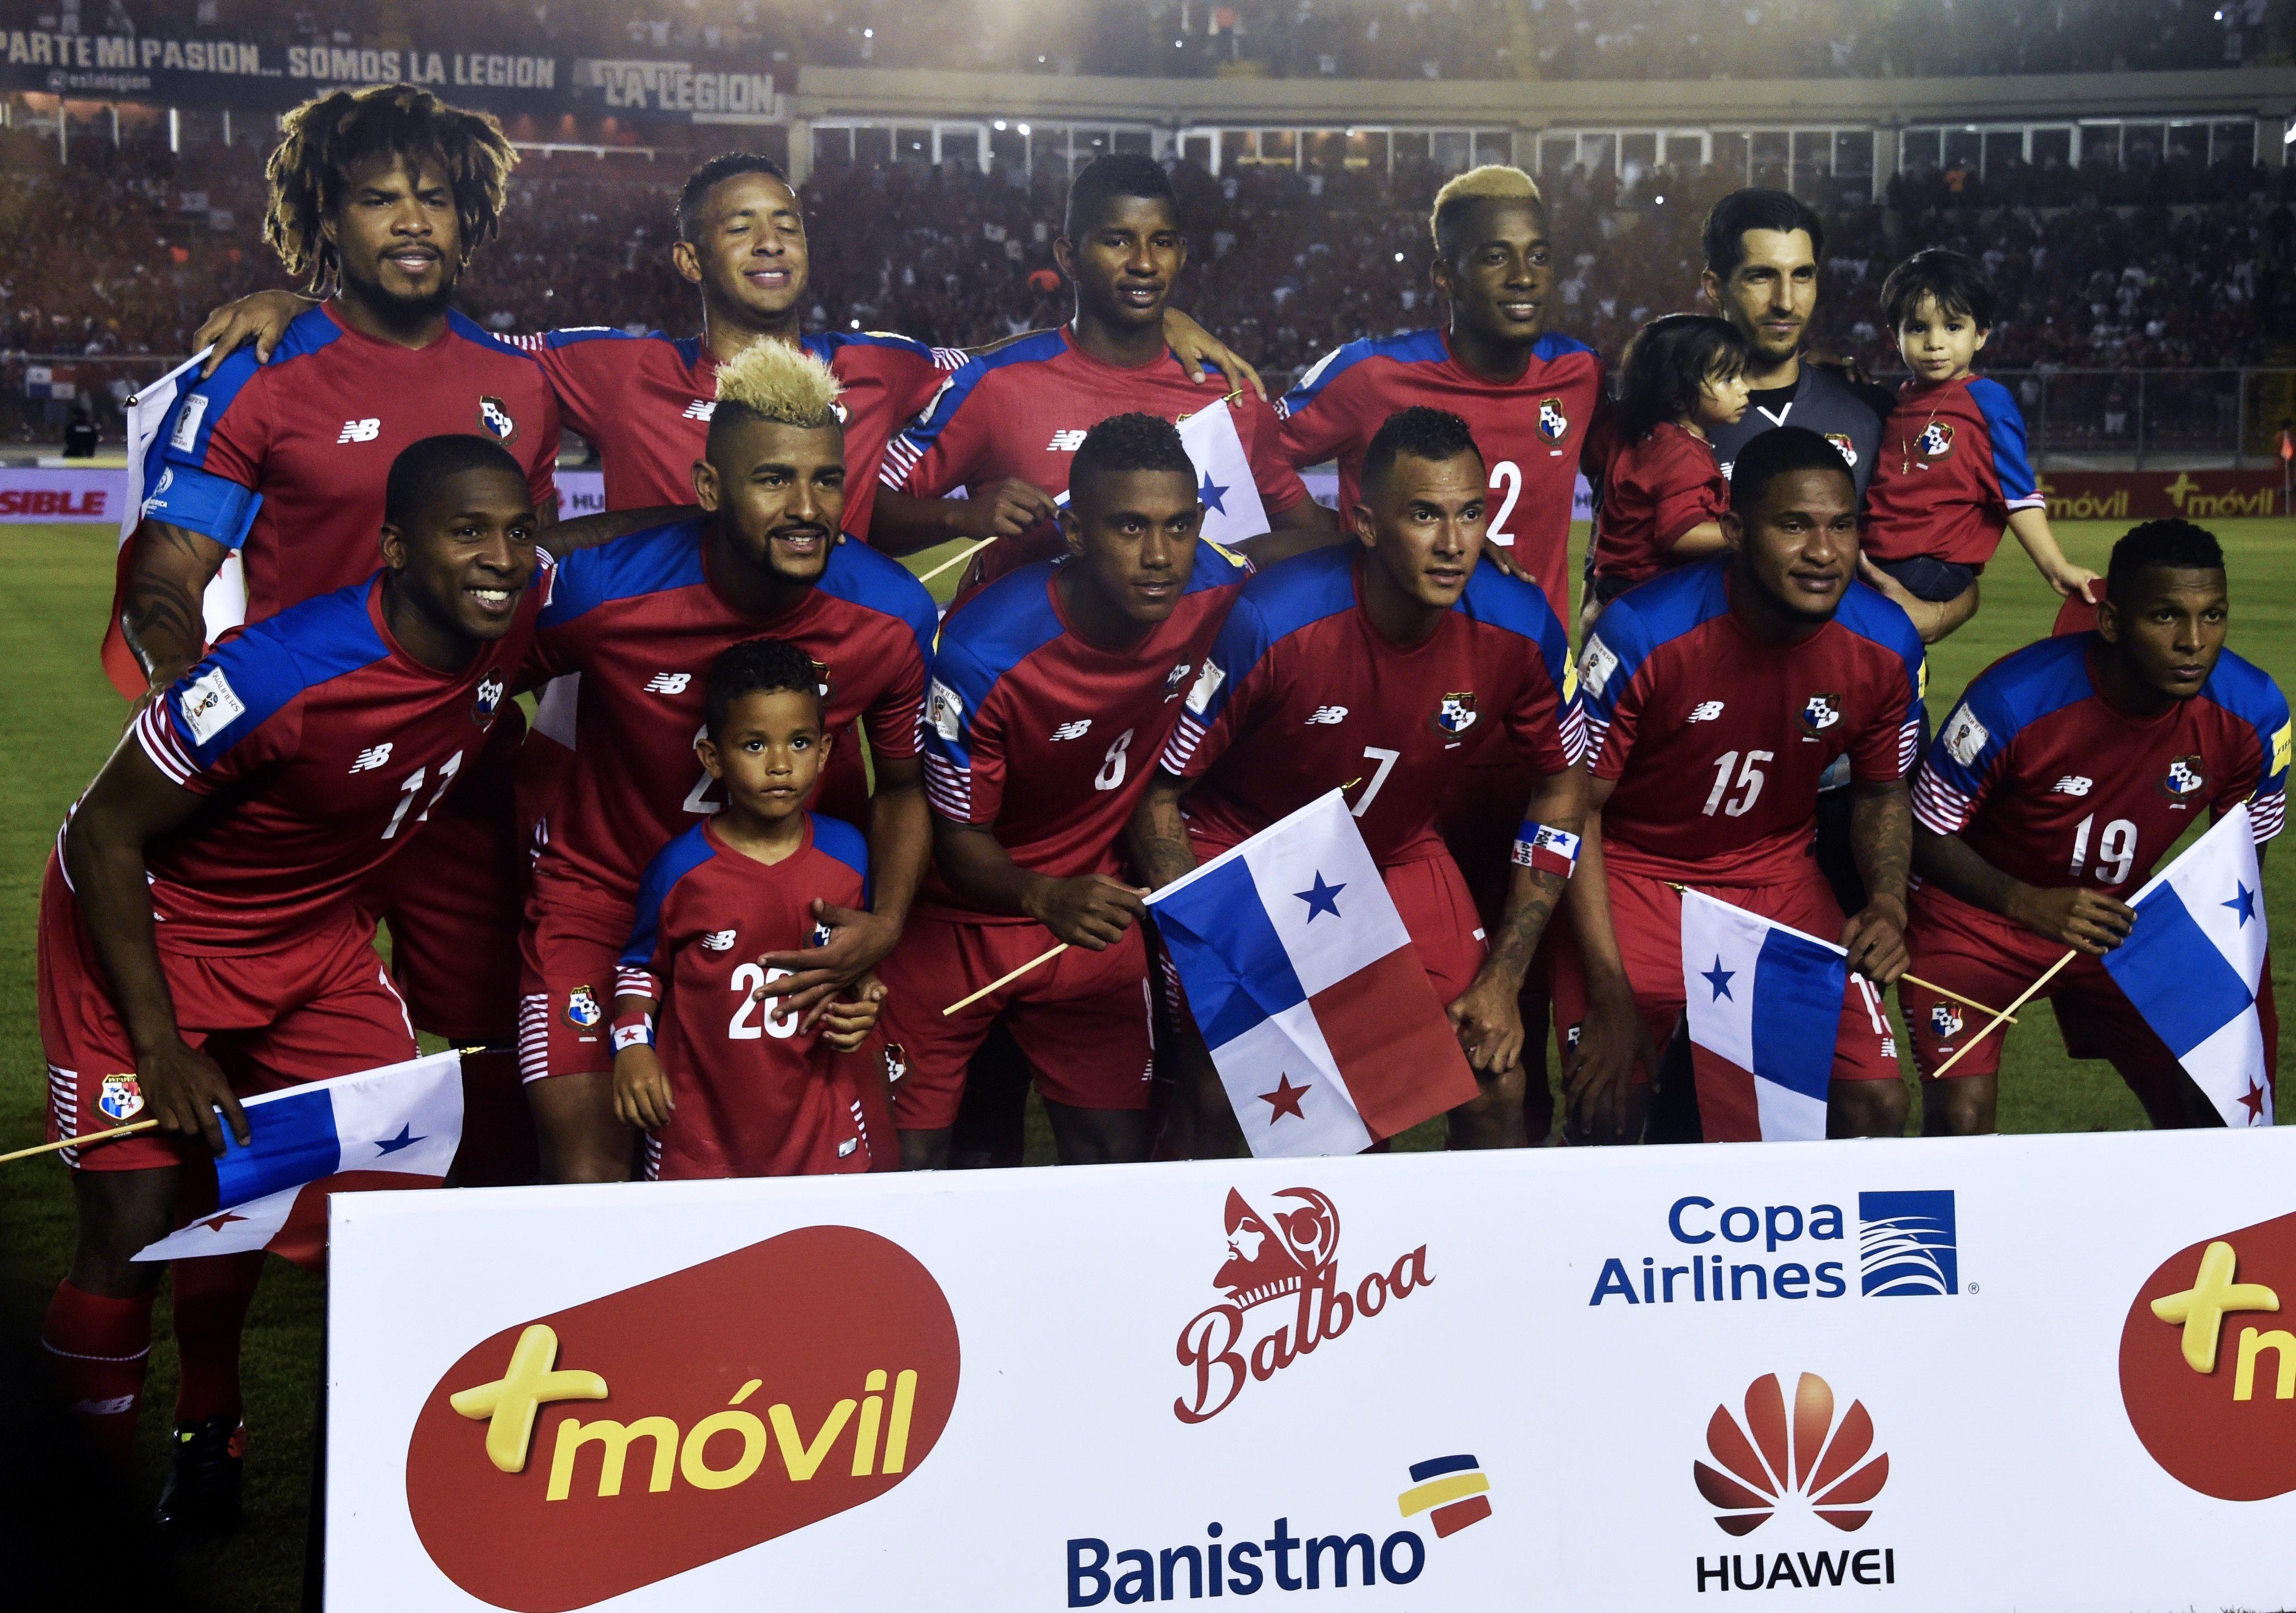 Panama national team